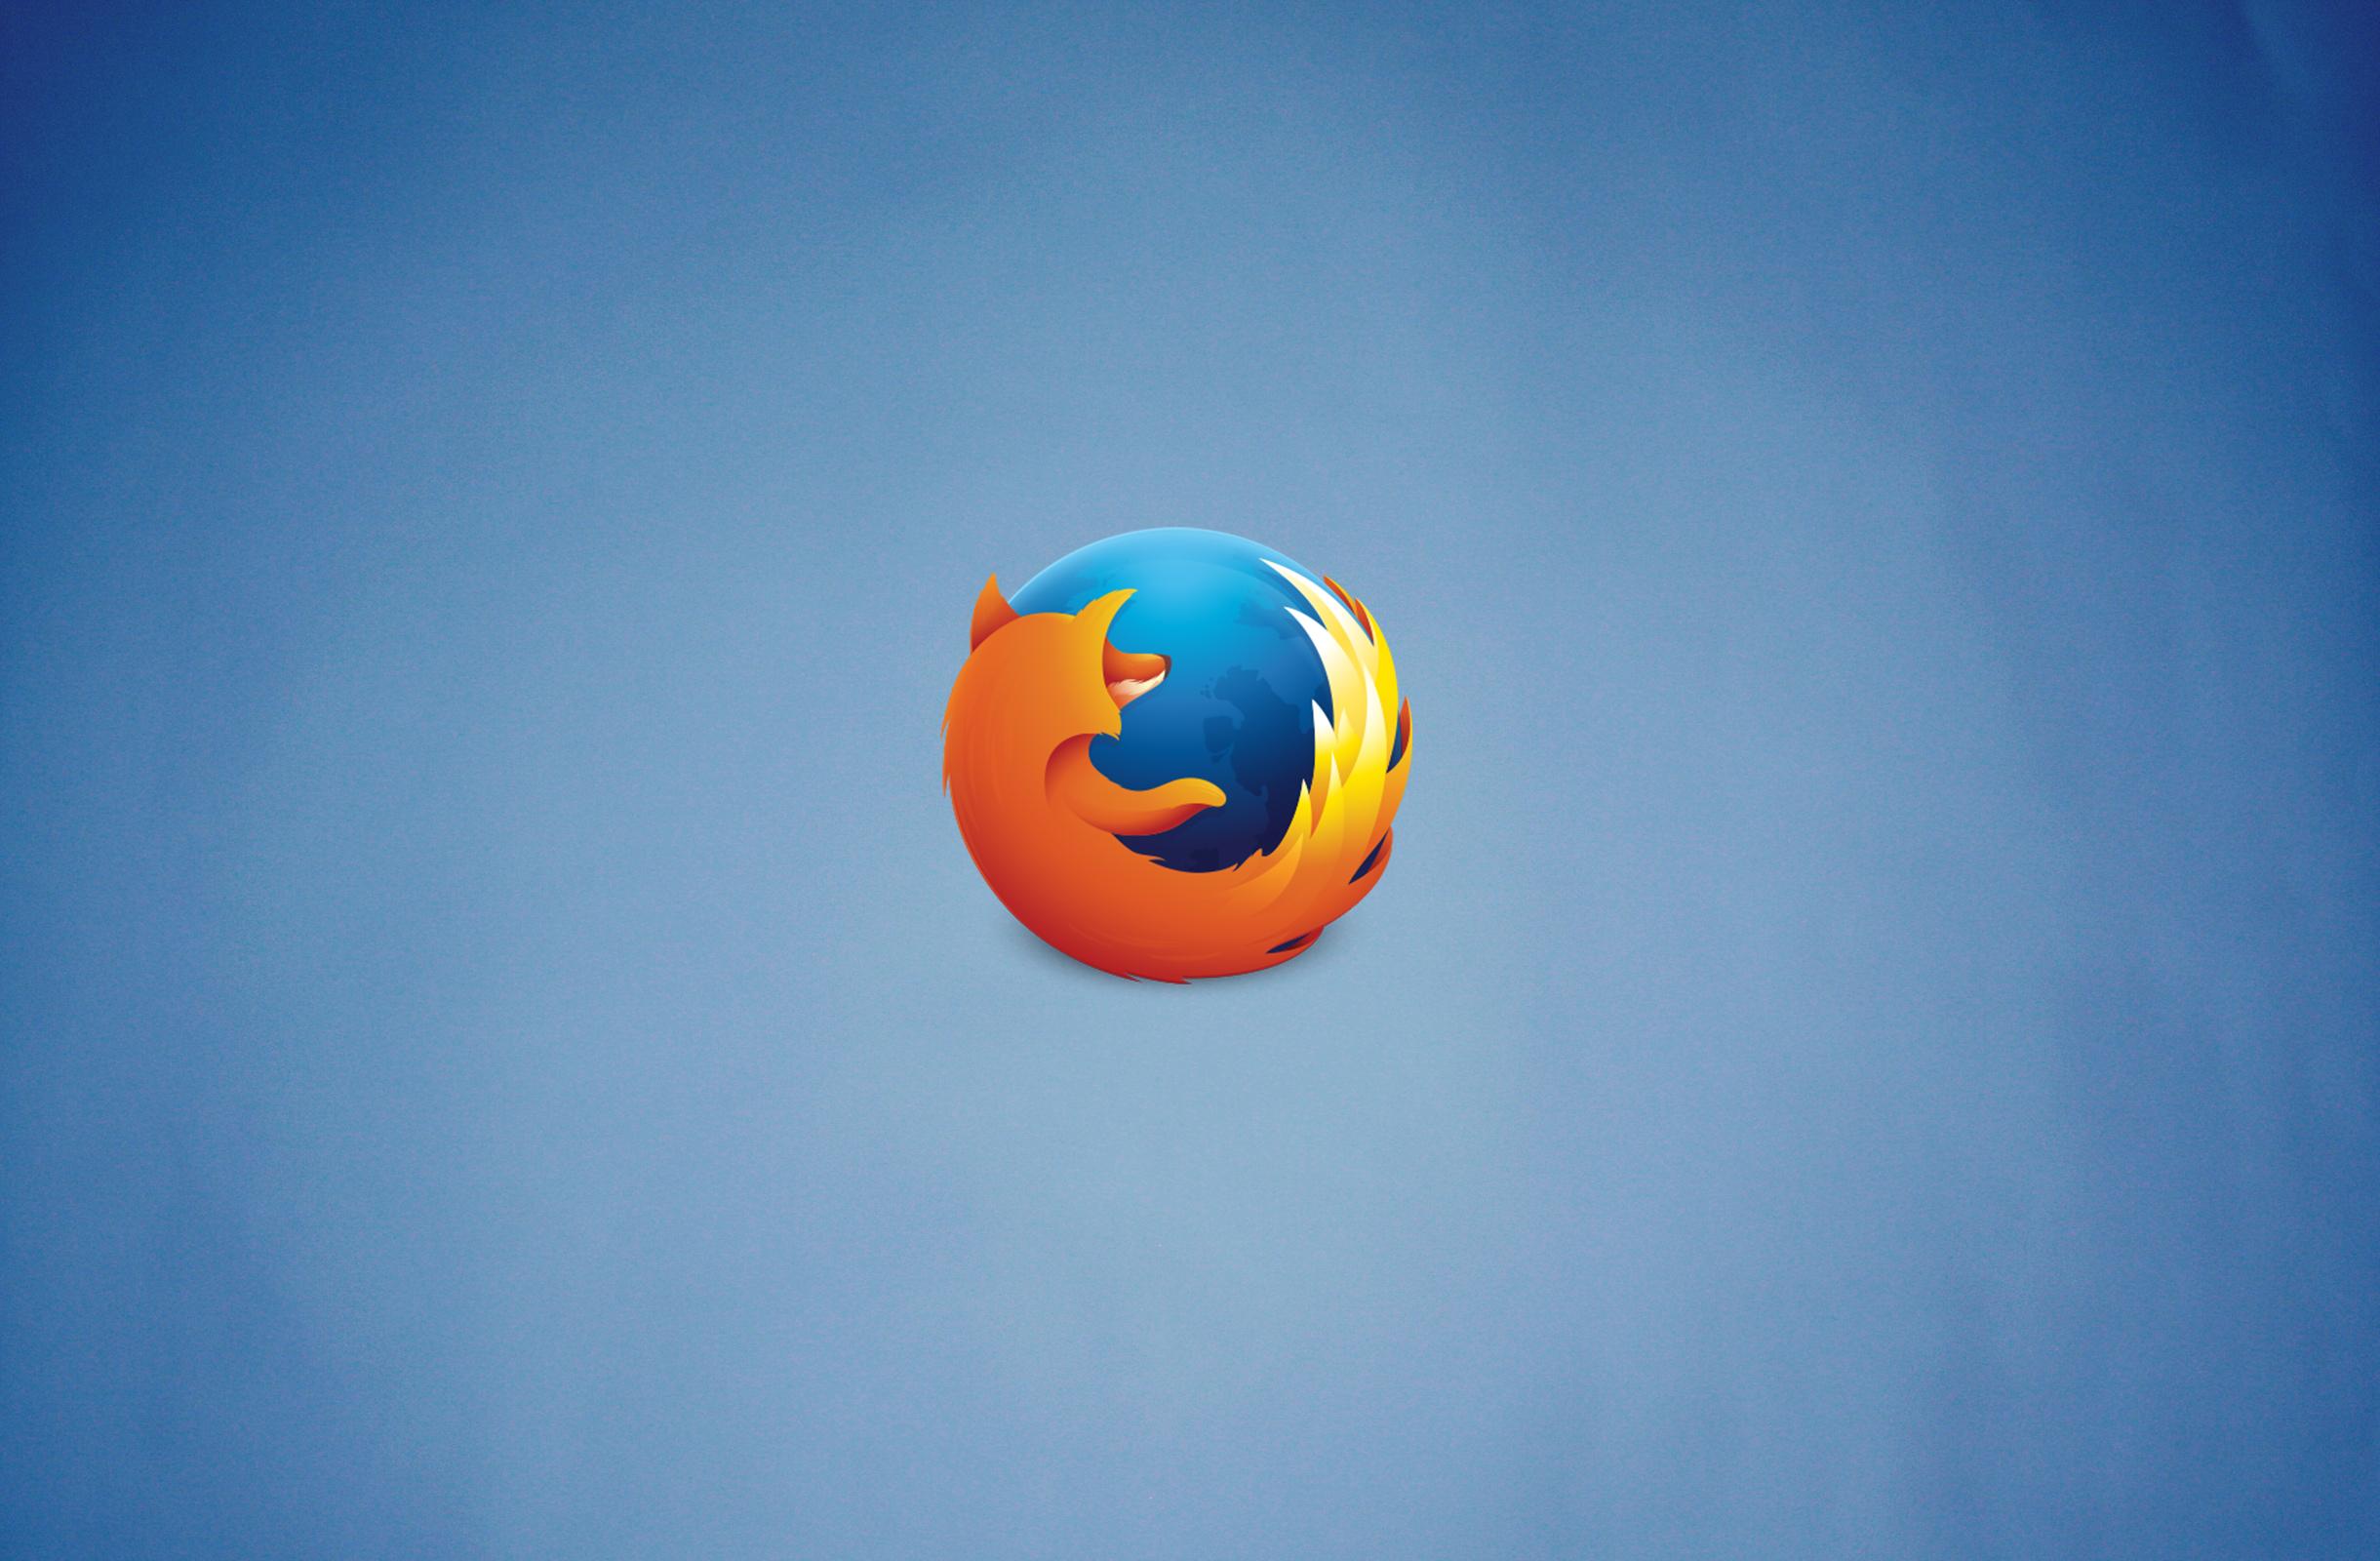 Firefox serenity hd wallpaper background image - How to change firefox background image ...